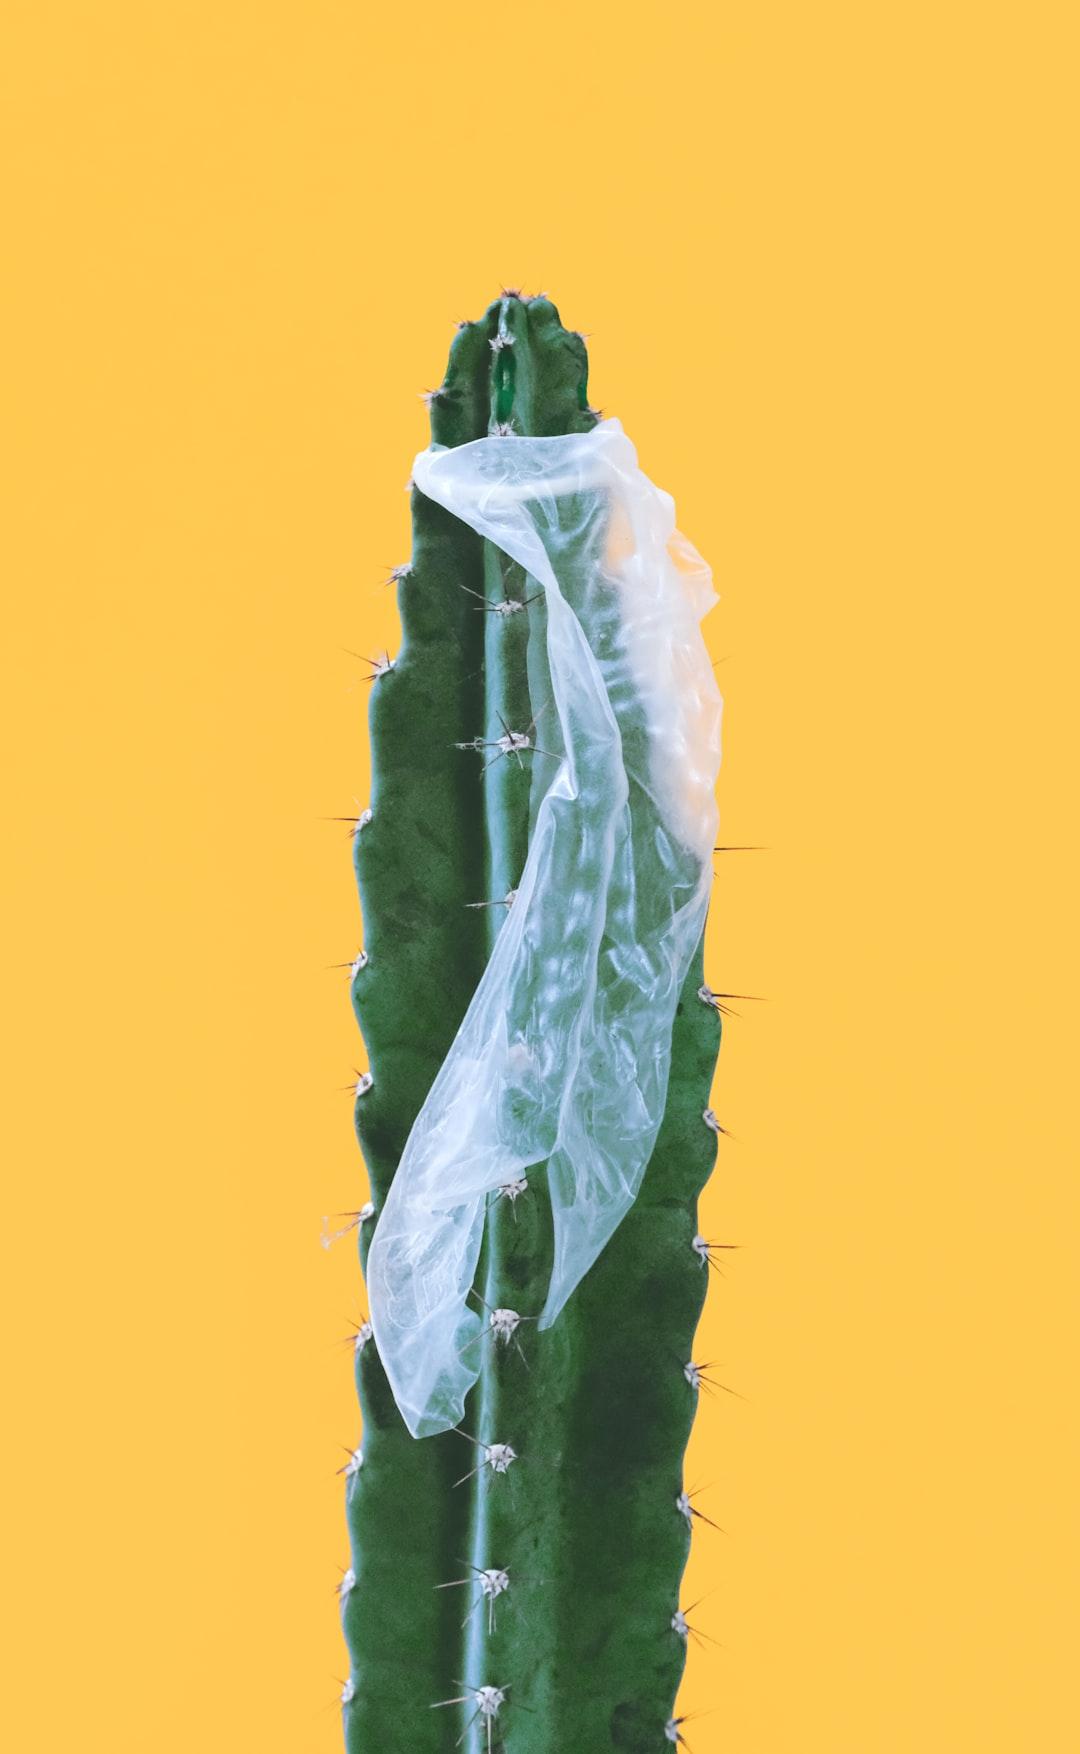 Sex Education: Can a condom break?